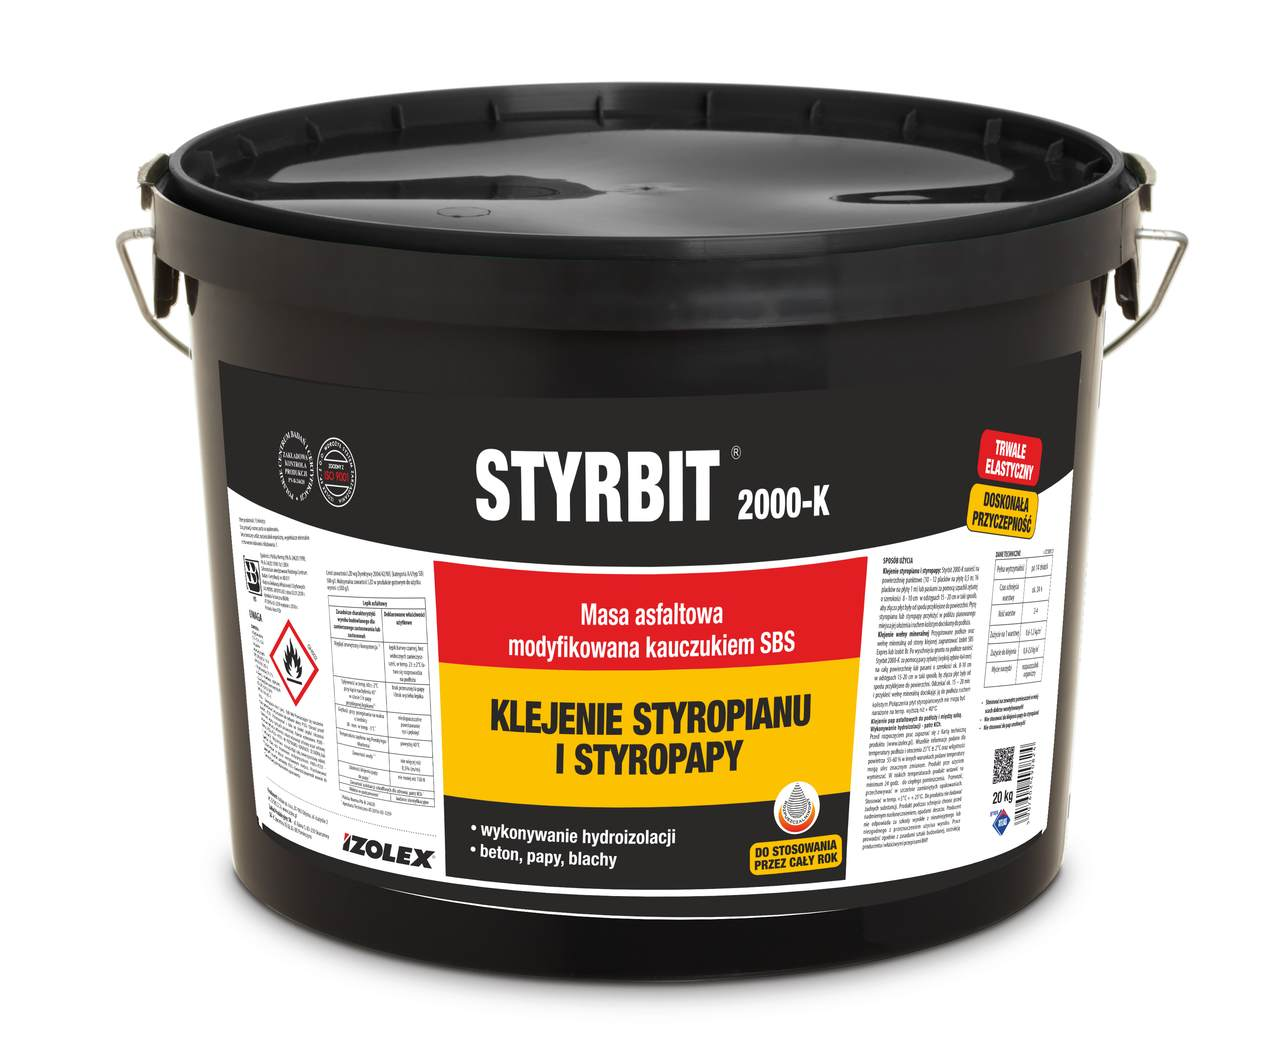 STYRBIT 2000‑K